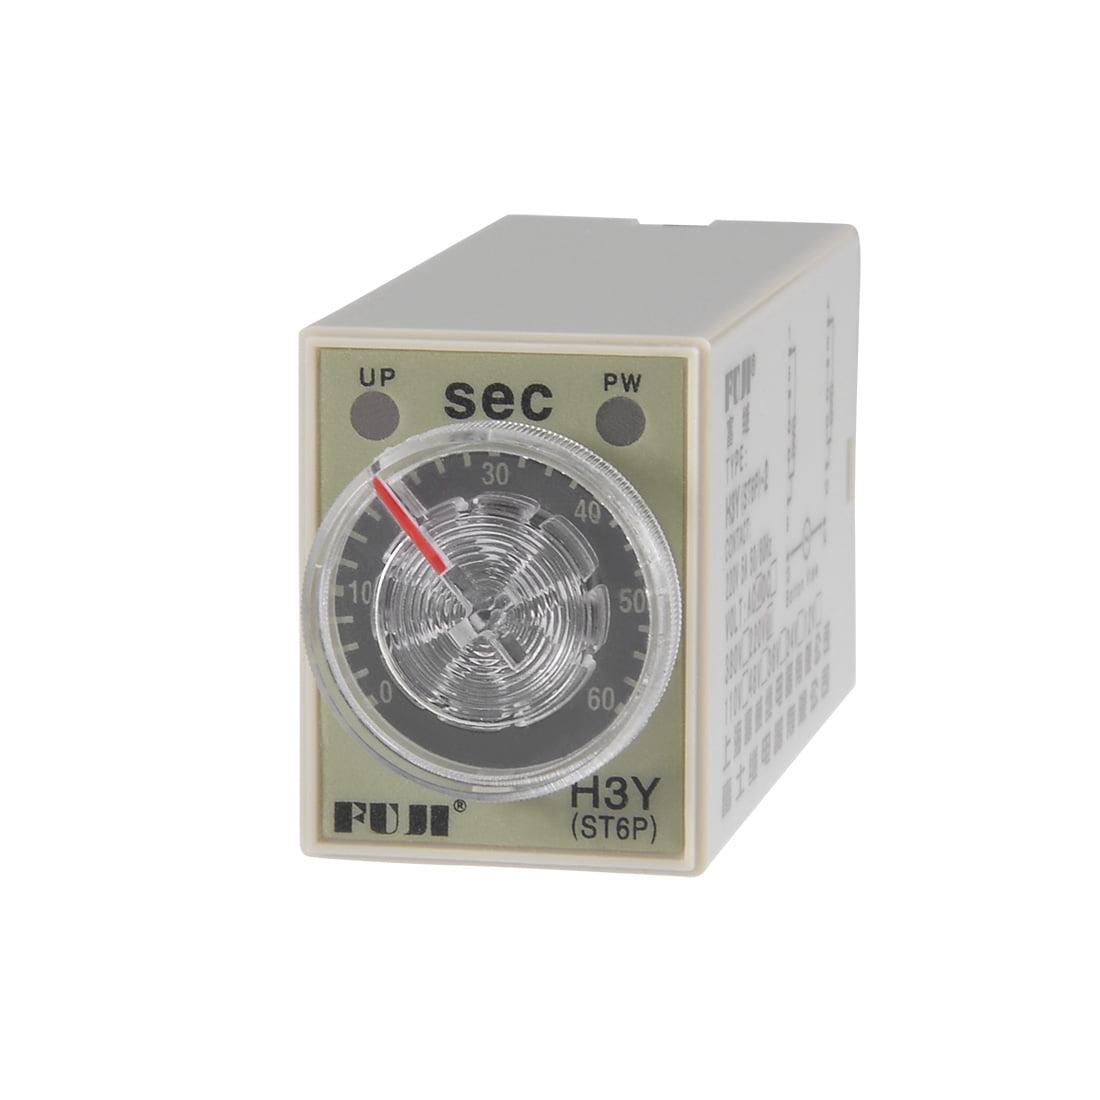 220VAC 60S 8 Terminals Range Adjustable Delay Timer Time Relay H3Y-2 w base - image 1 of 6